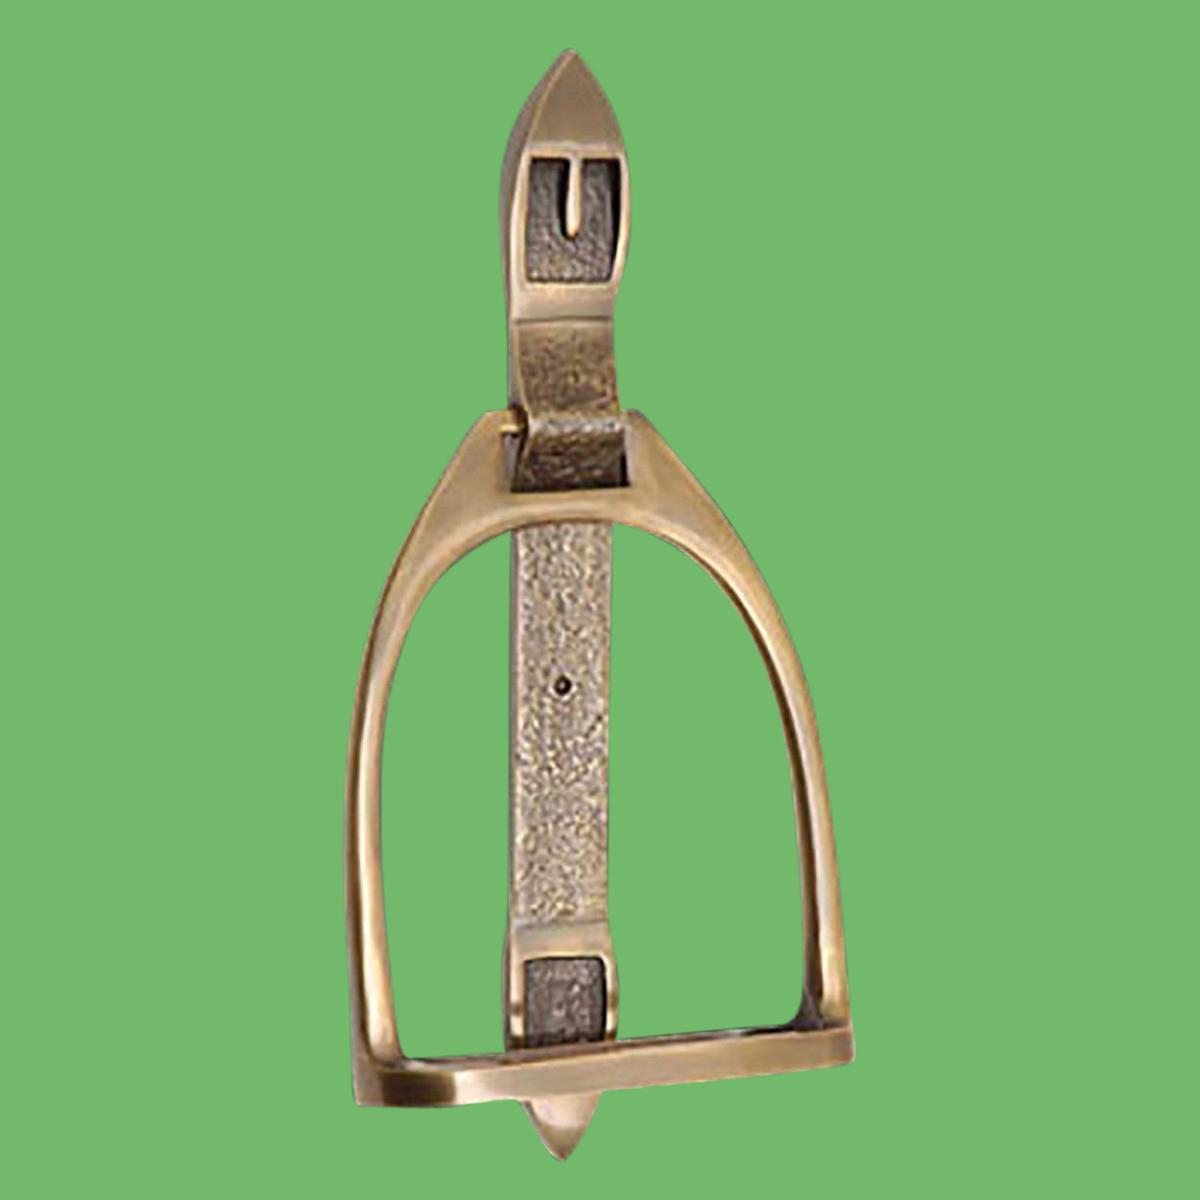 Antique brass large door knocker stirrup 9 5 h - Antique brass door knocker ...